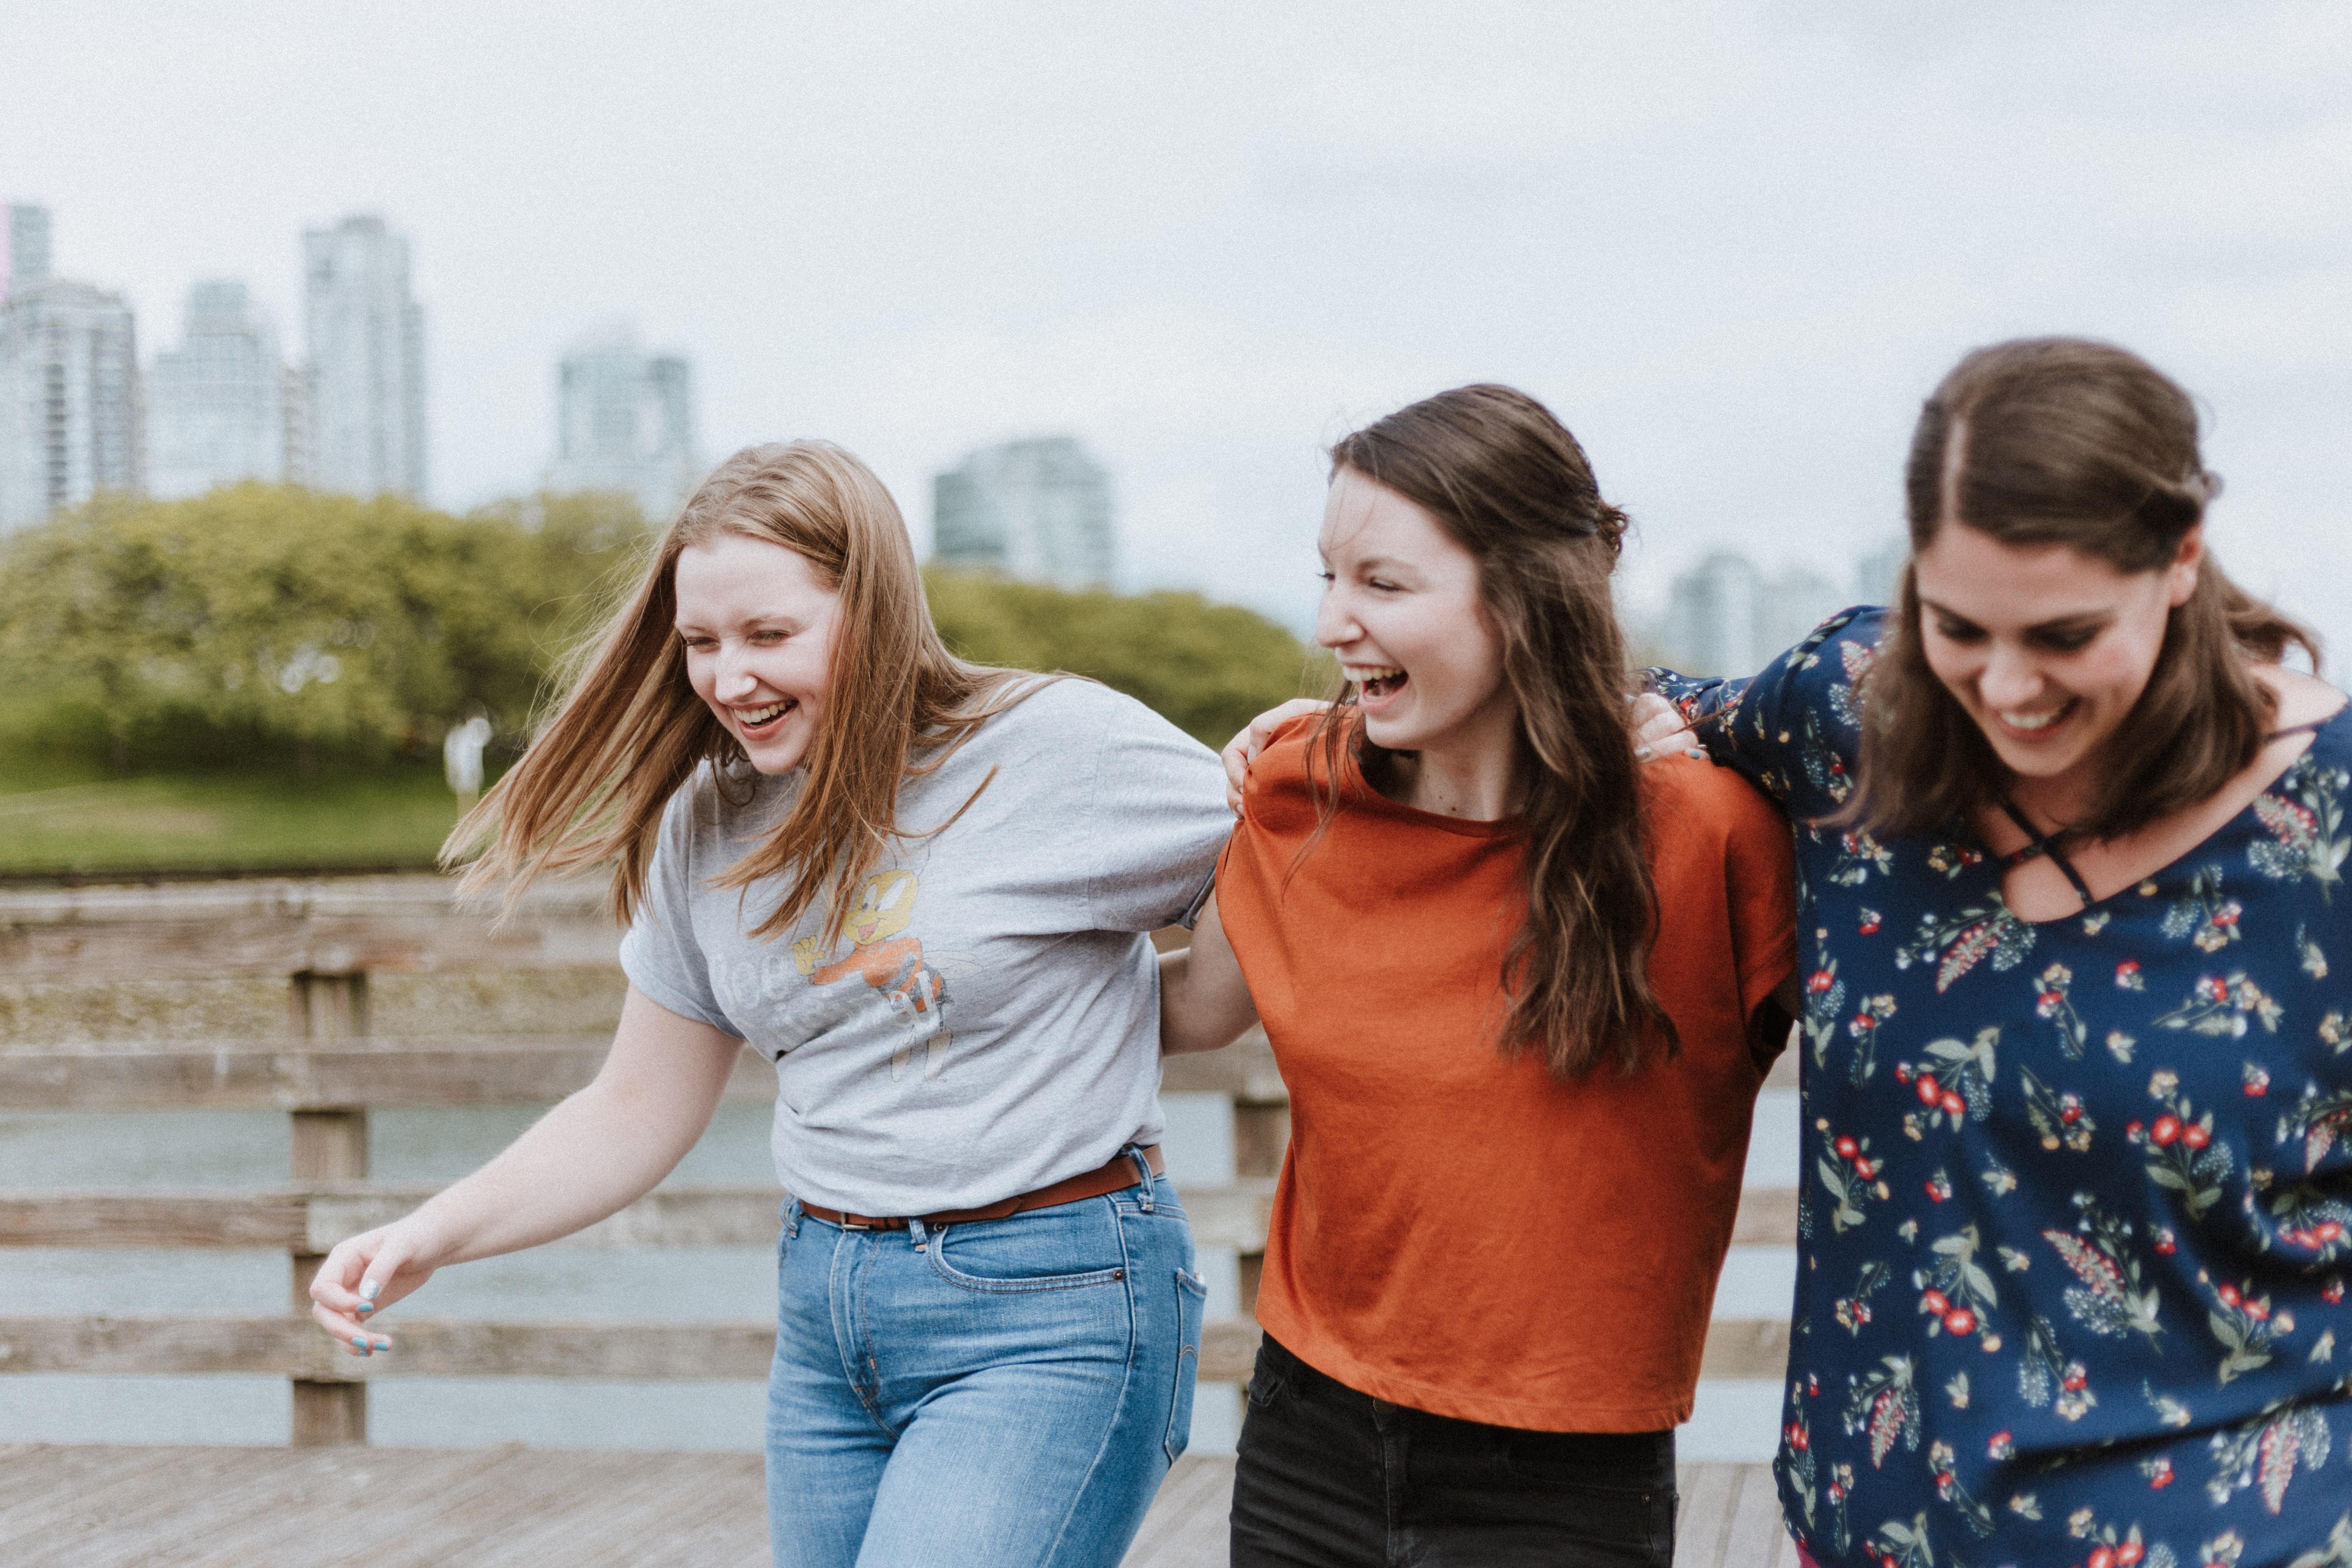 Students walking together